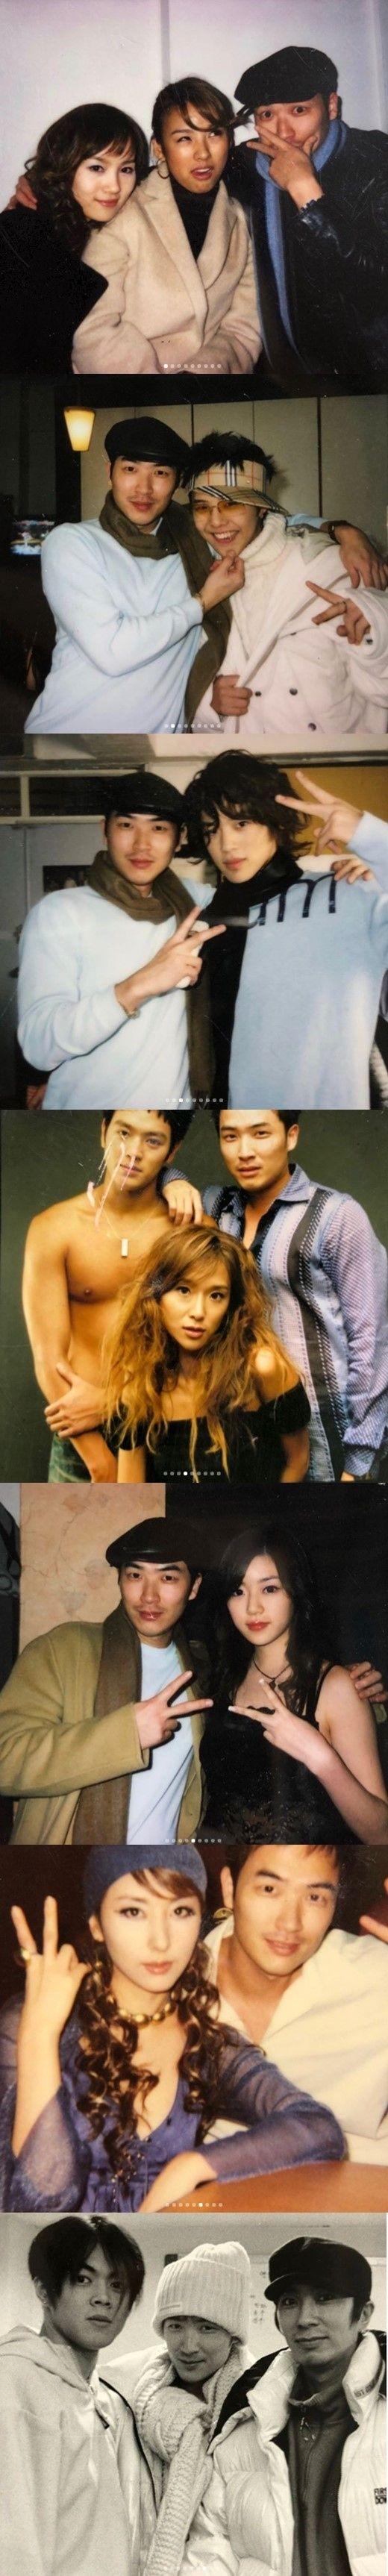 【BIGBANG NEWS】G-DRAGONの姿も!スター10人の過去写真が話題…2000年代ファッションに注目